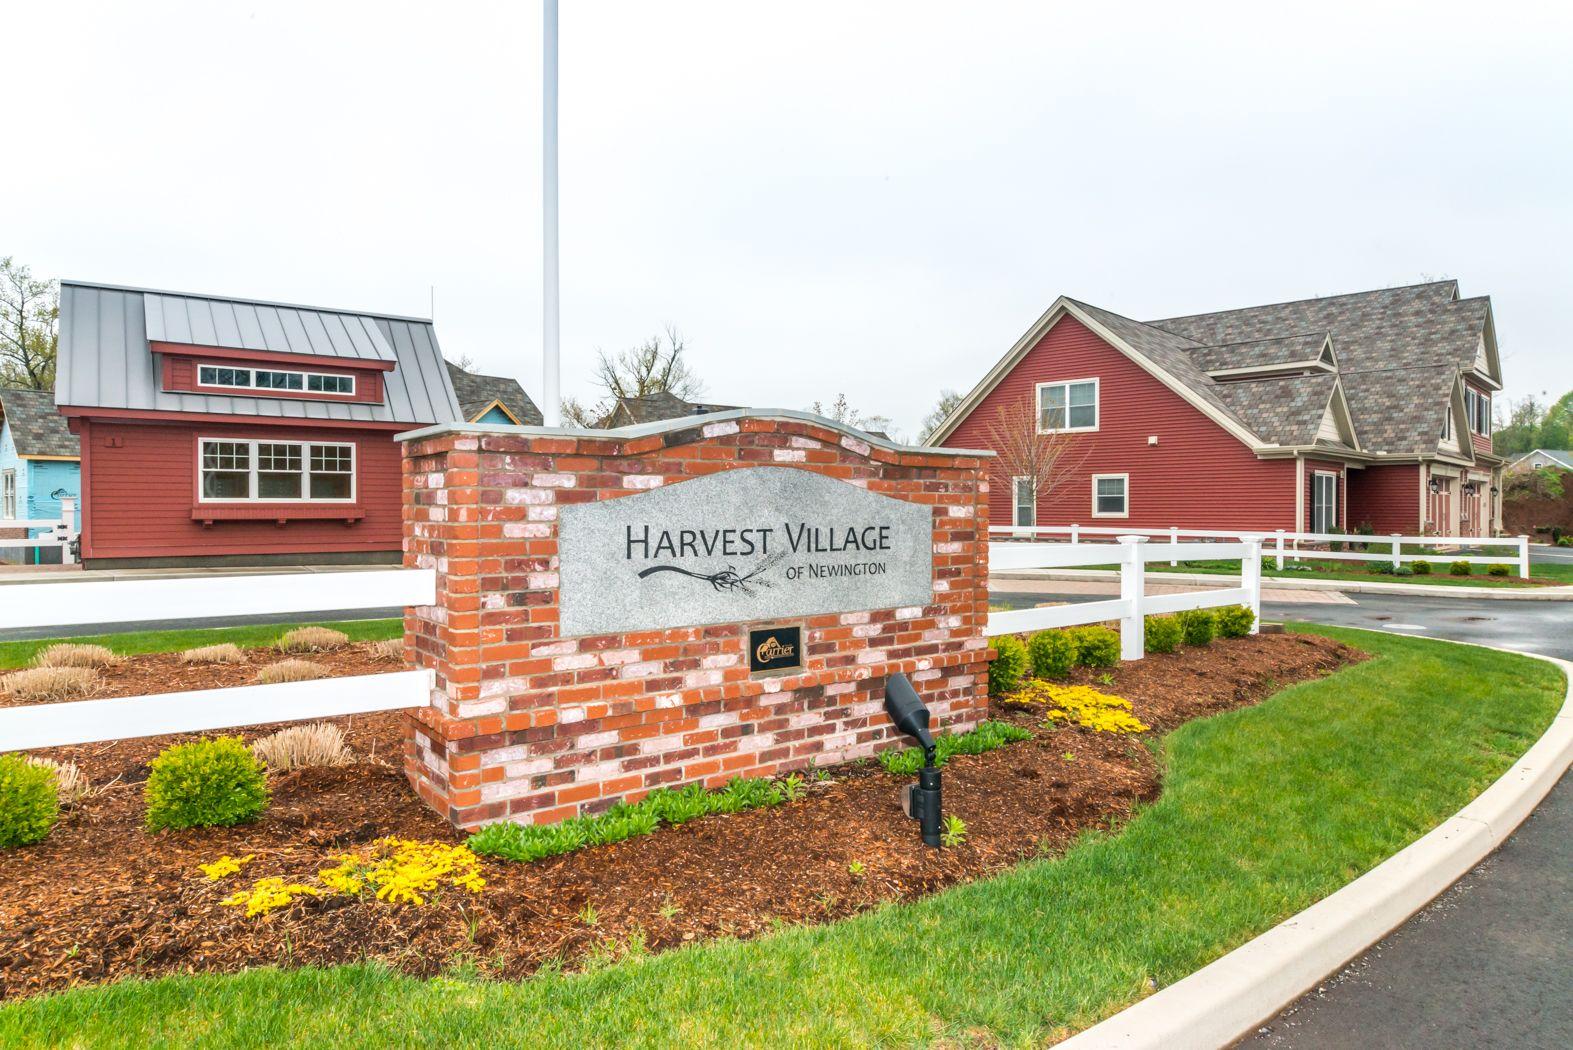 82 Harvest Ct 82 Newington Ct George J Santos Associates Http Www Gsantoshomes Com New Home Construction New Home Communities New Homes